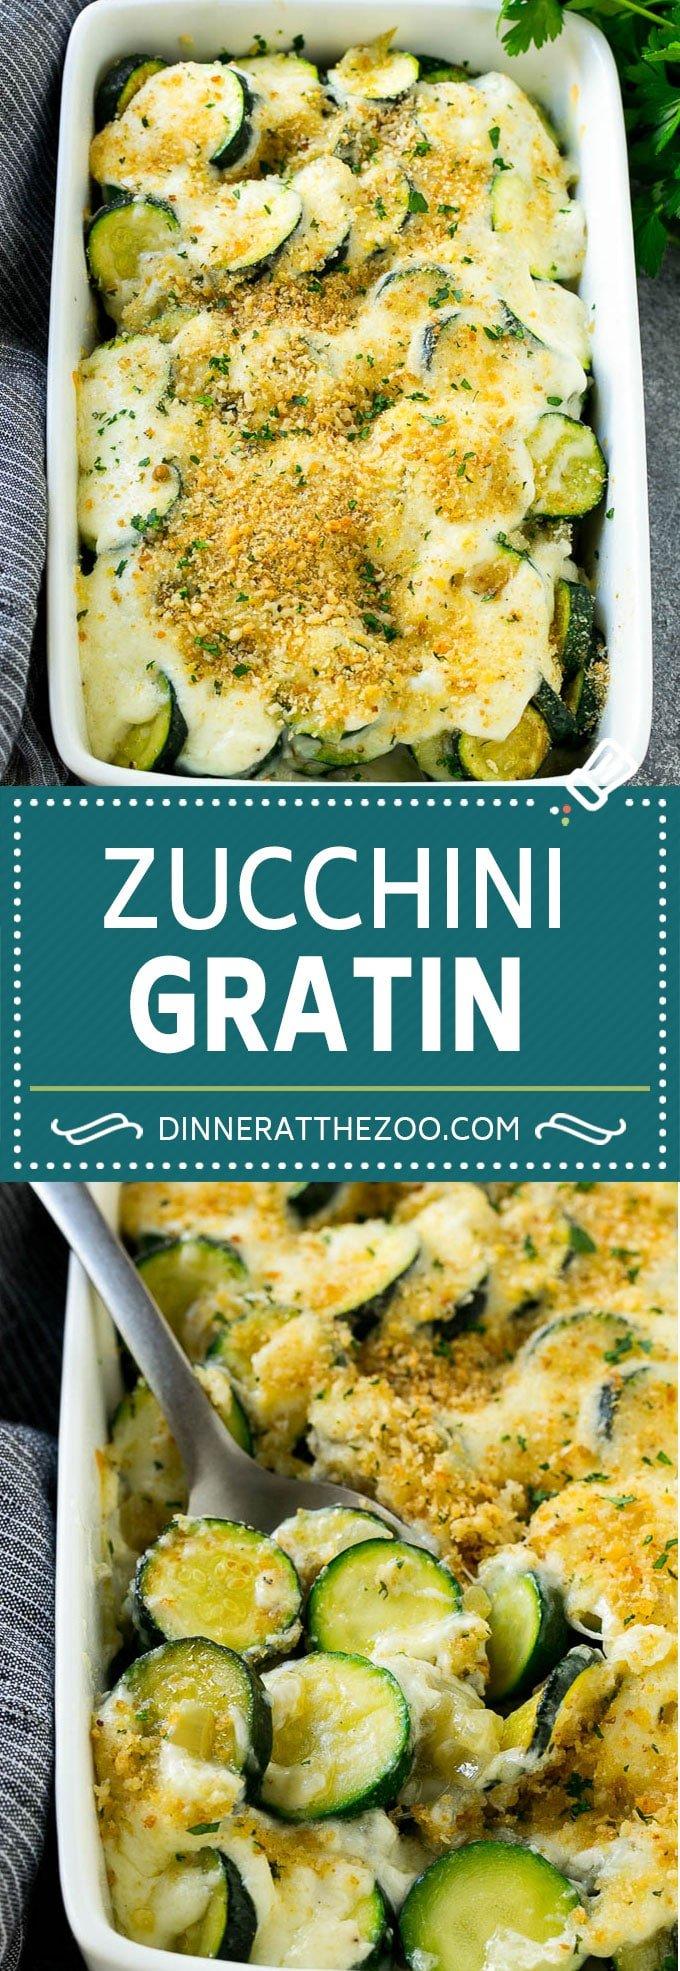 Zucchini Gratin Recipe | Cheesy Zucchini | Baked Zucchini | Easy Zucchini Recipe #zucchini #casserole #cheese #dinner #sidedish #dinneratthezoo